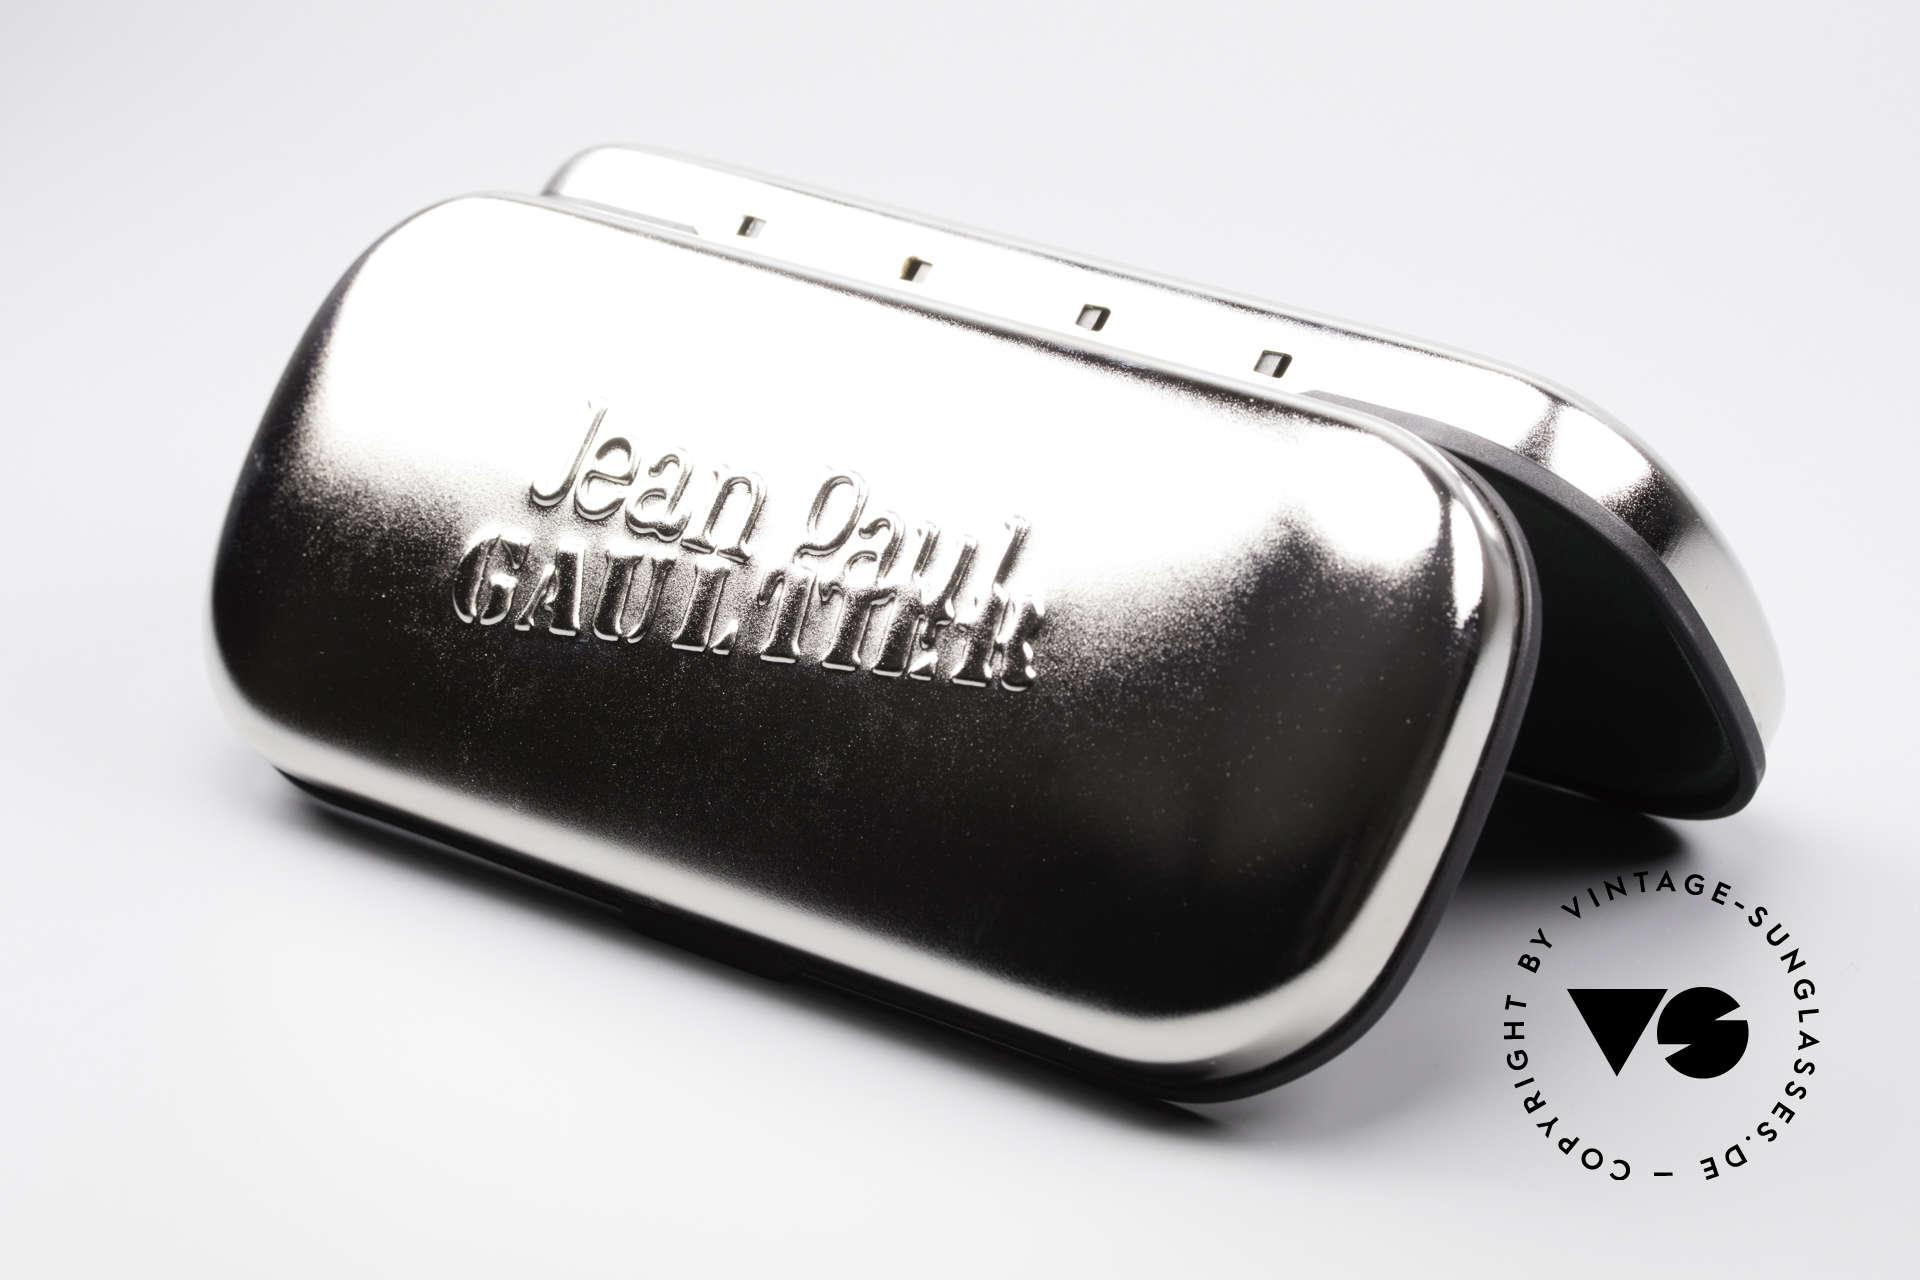 Jean Paul Gaultier 55-5106 Steampunk Sunglasses, Size: medium, Made for Men and Women